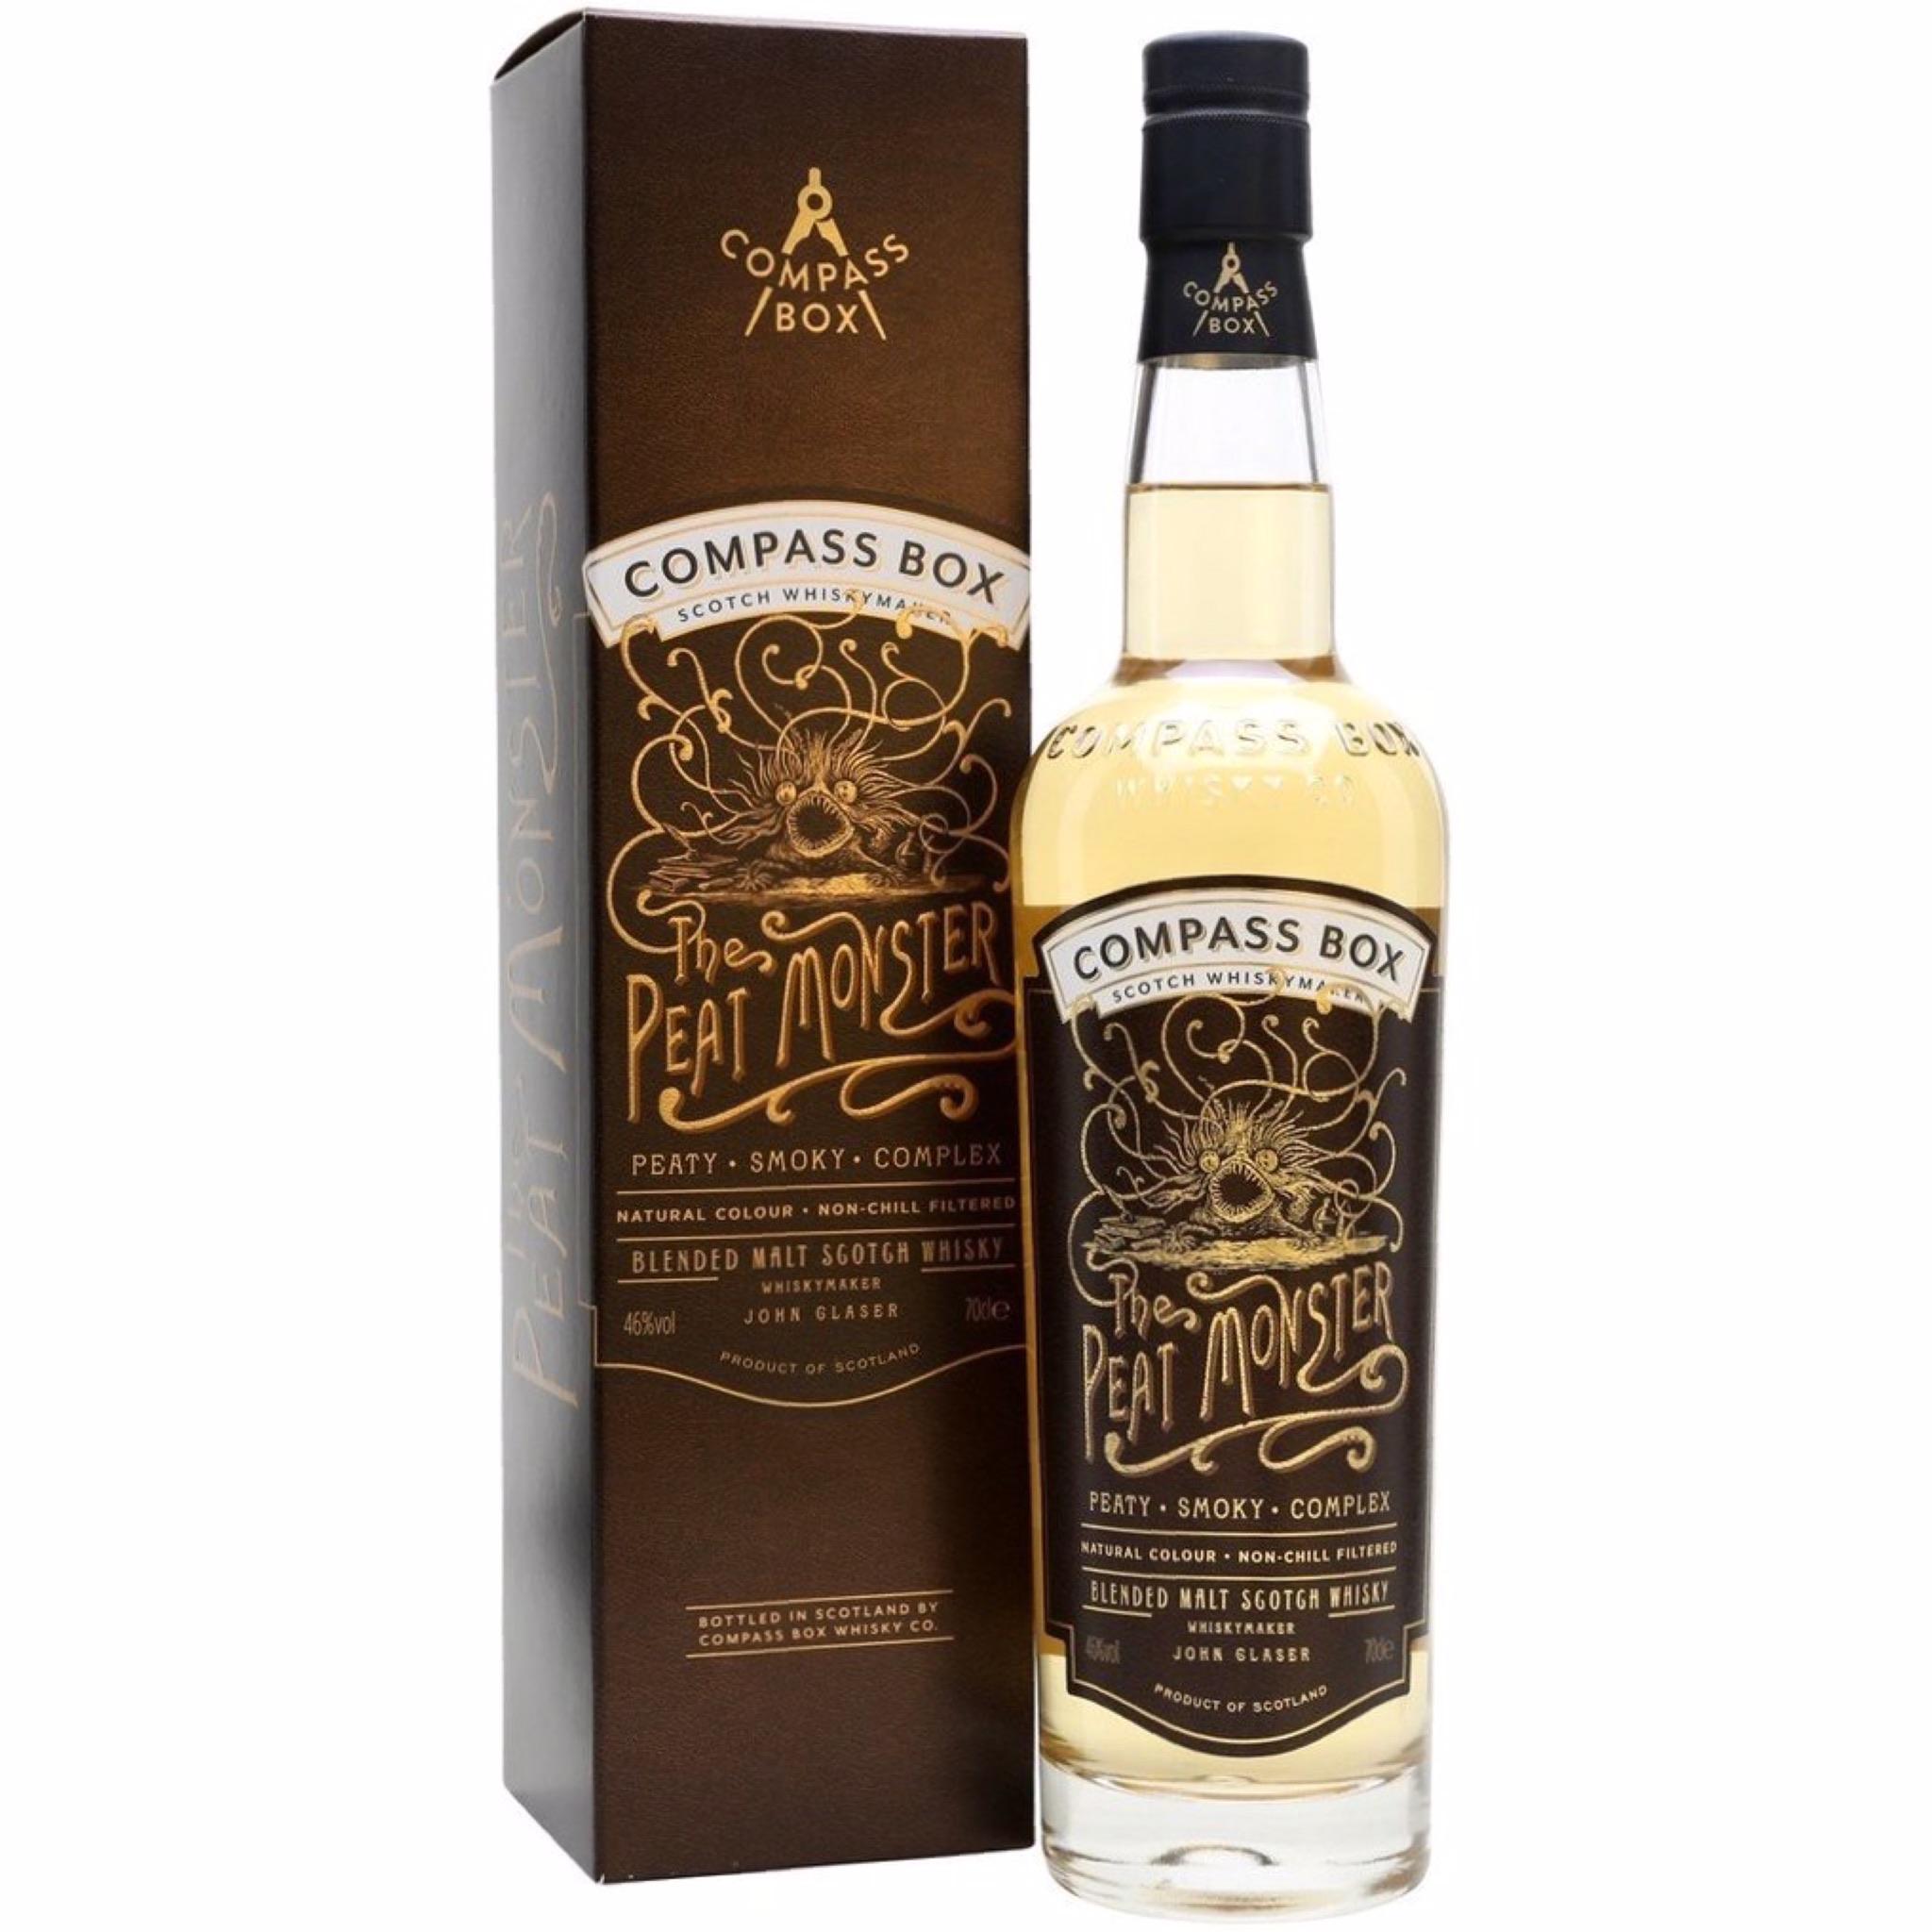 The Peat Monster - Blended Malt Scotch Whisky 46% 700ml Compass Box